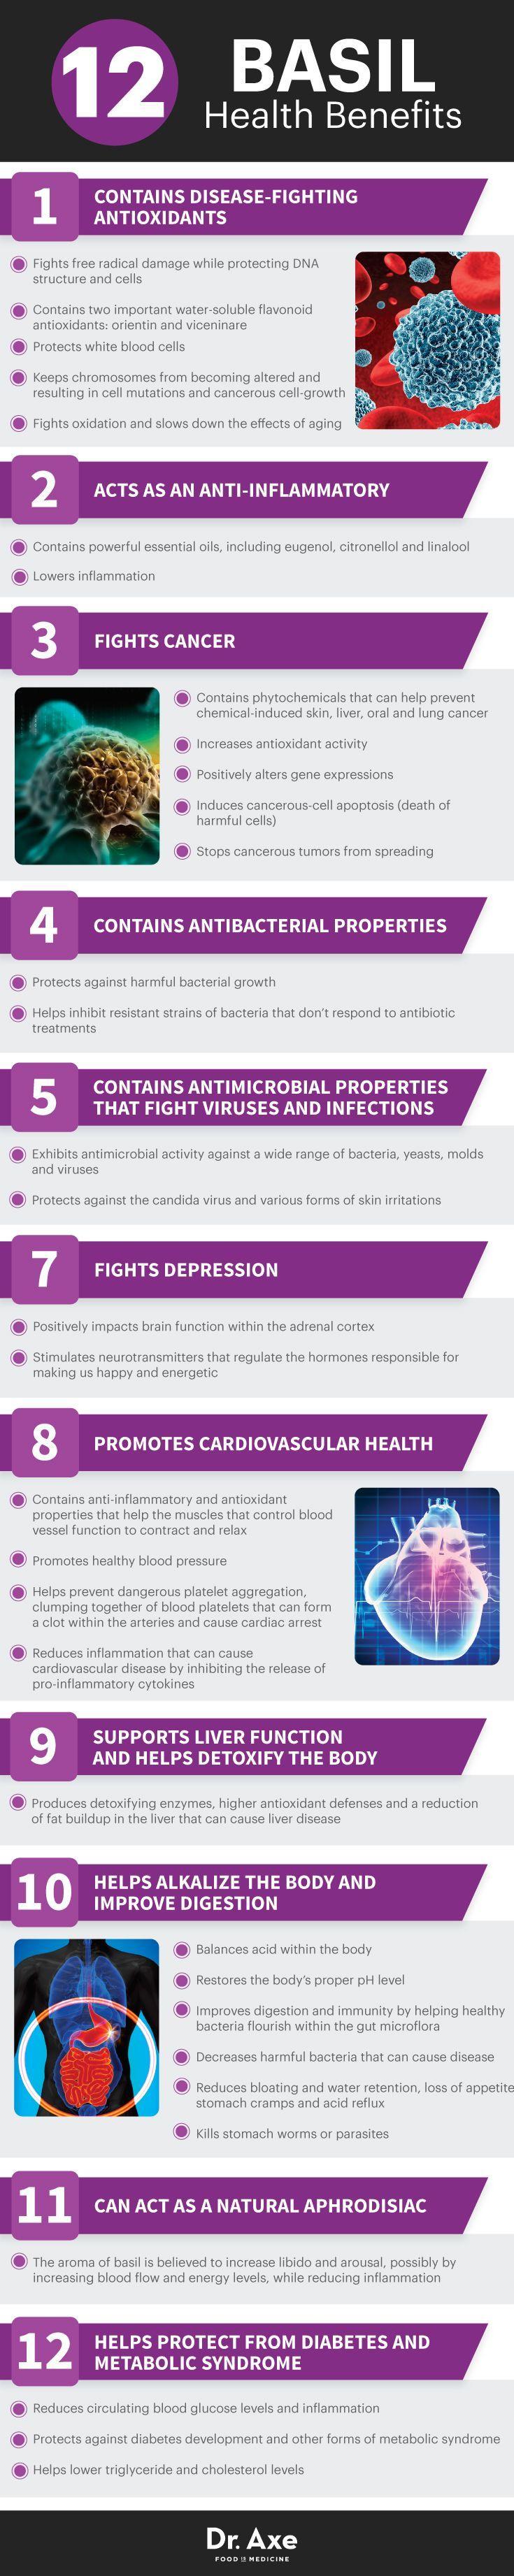 Basil benefits - Dr. Axe http://www.draxe.com #health #holistic #natural